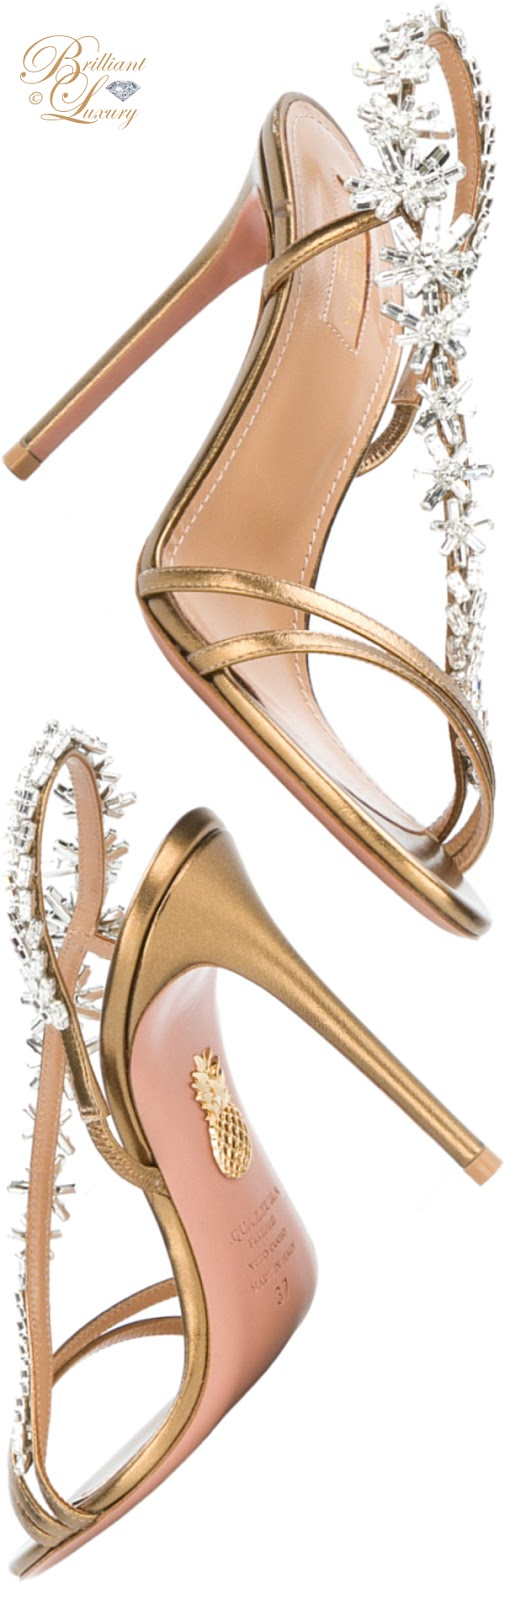 Brilliant Luxury ♦ Aquazzura Chateau sandals